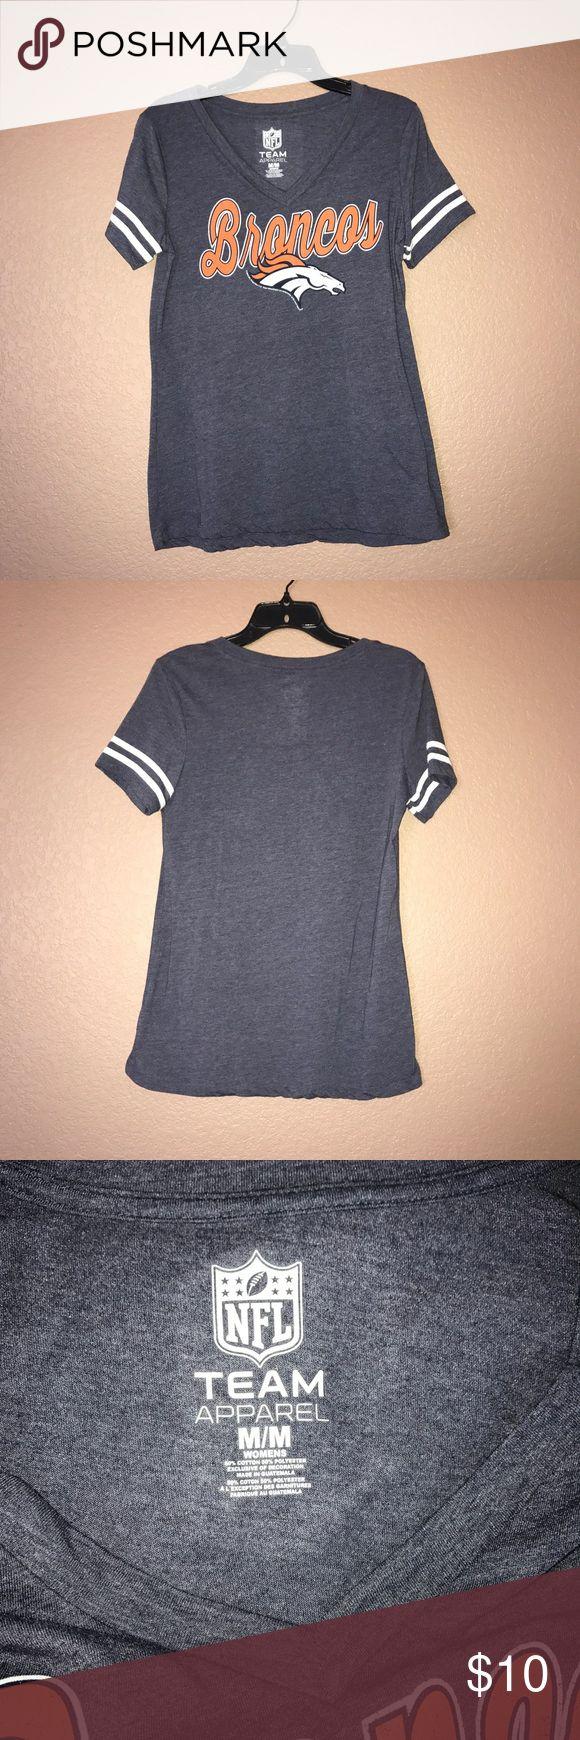 Black t shirt old navy - Old Navy Broncos T Shirt